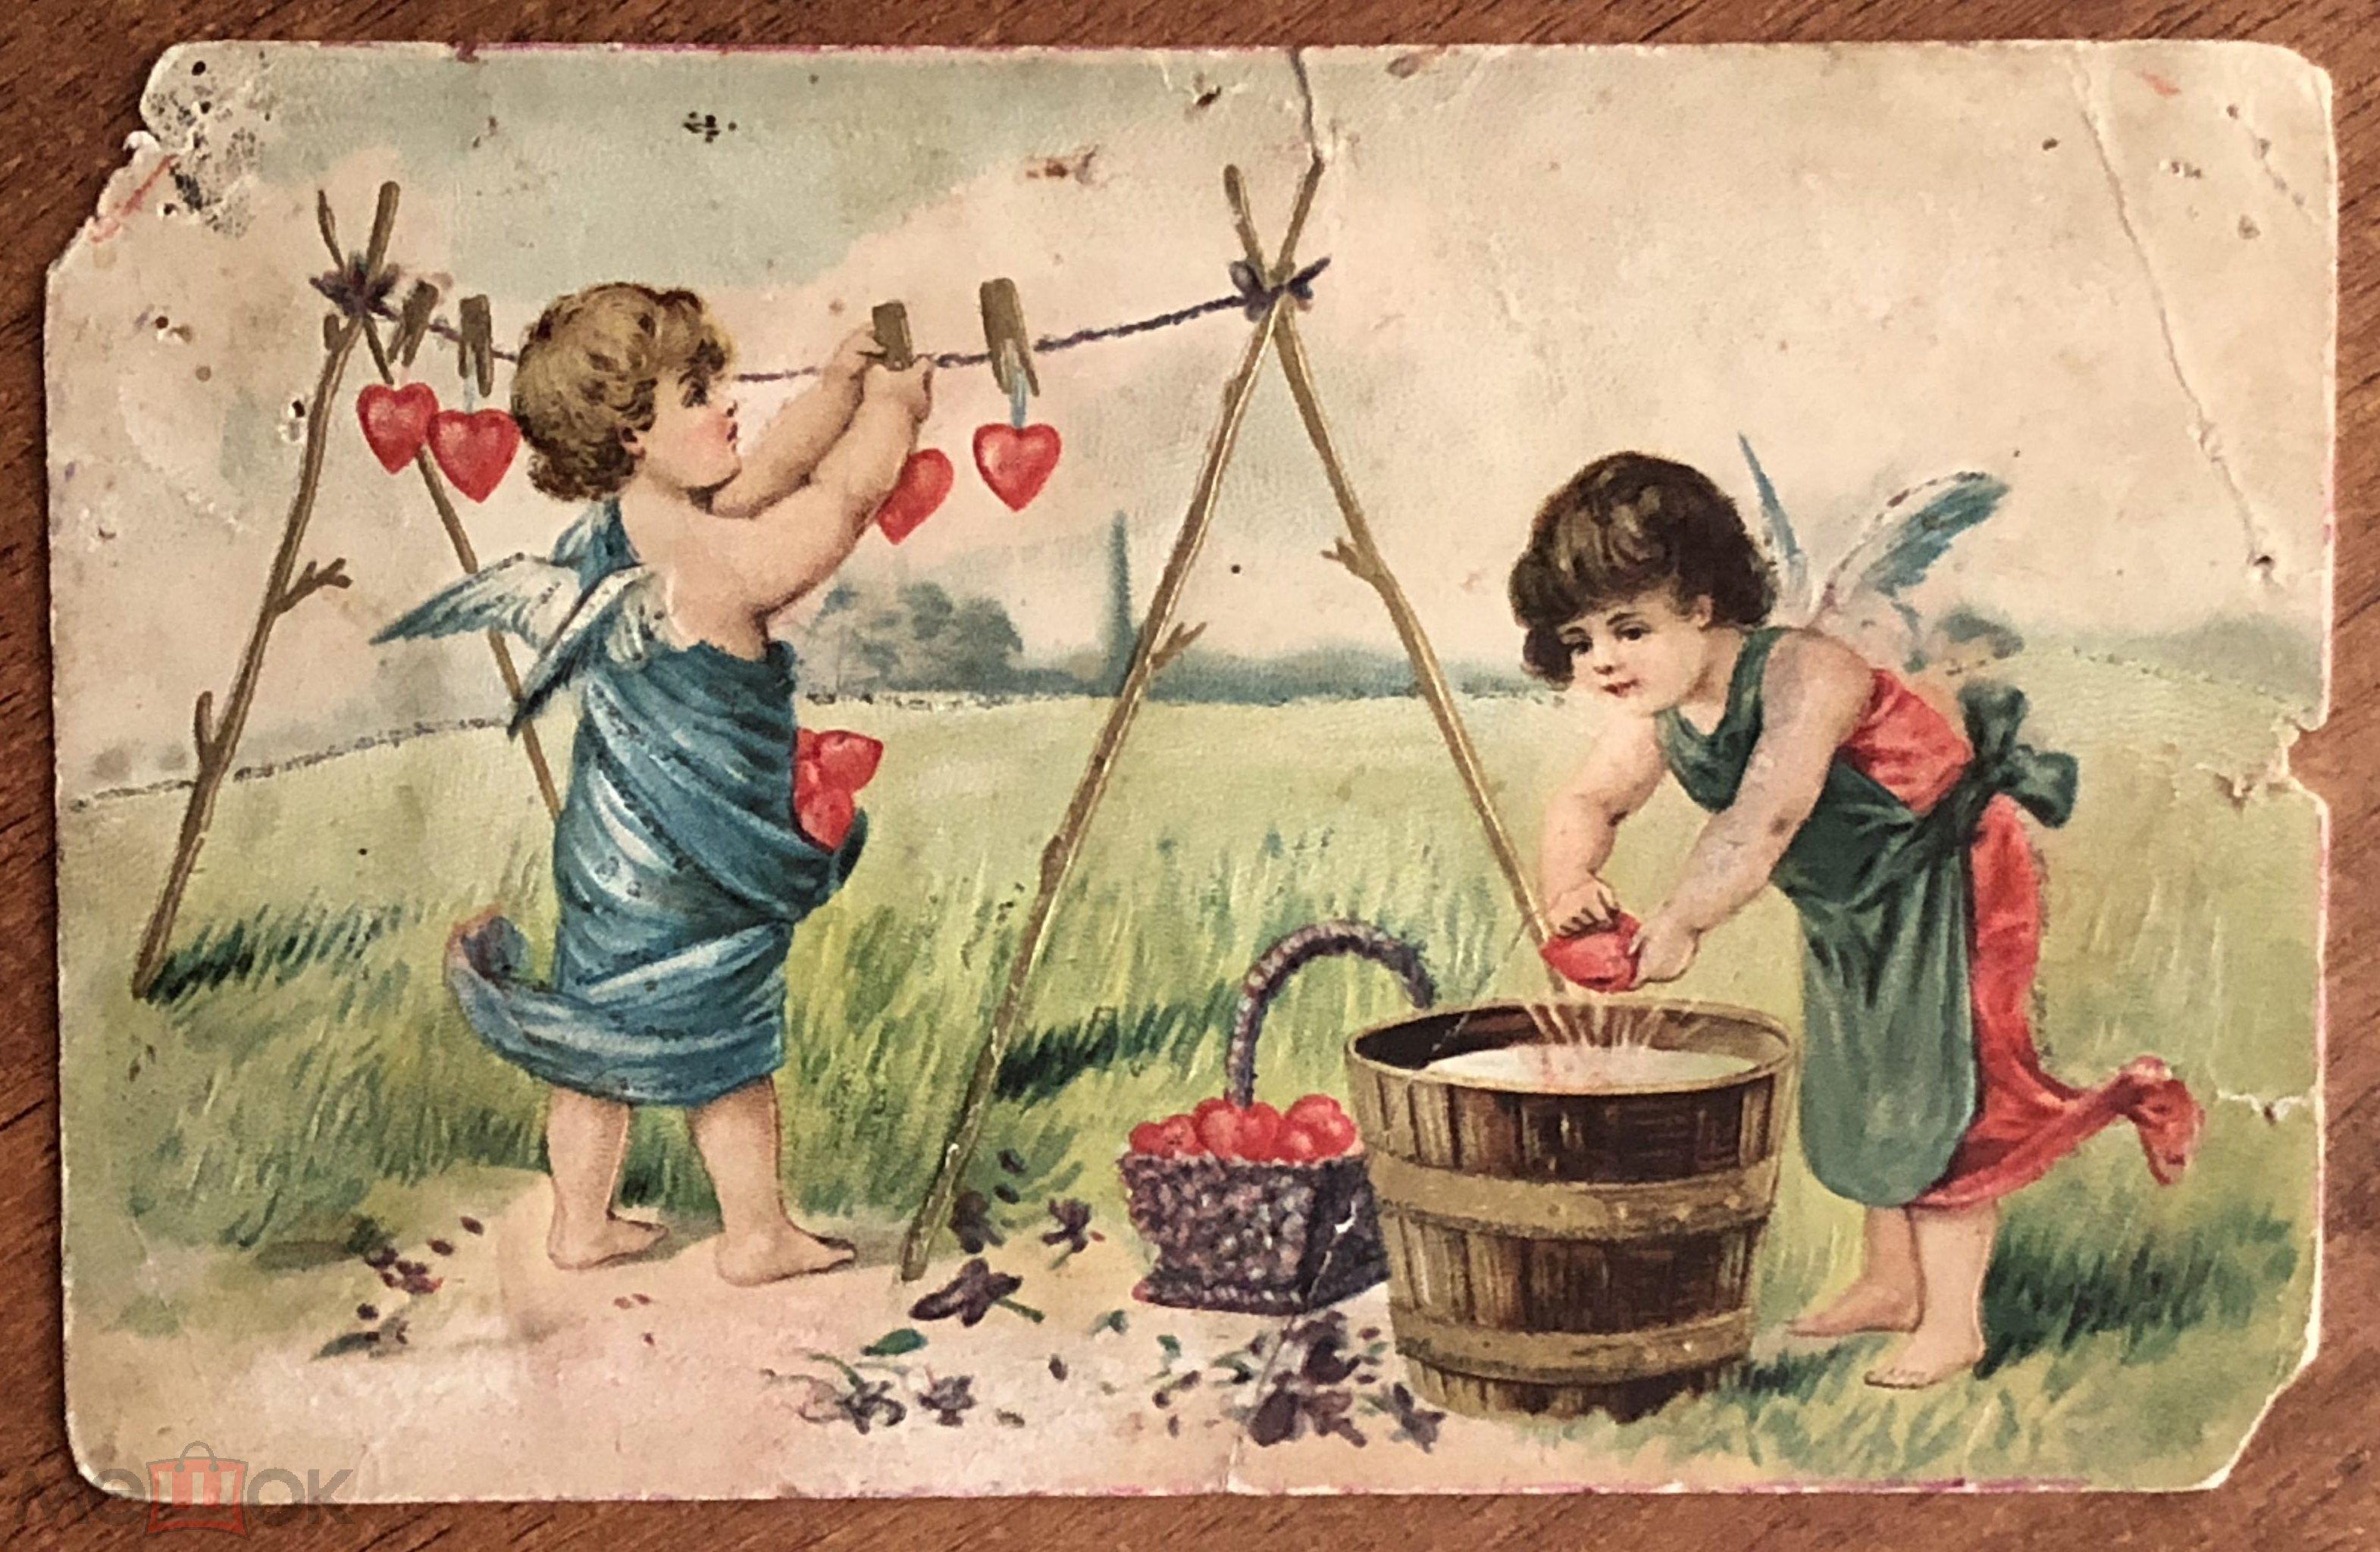 Картинках, старые открытки до 1920